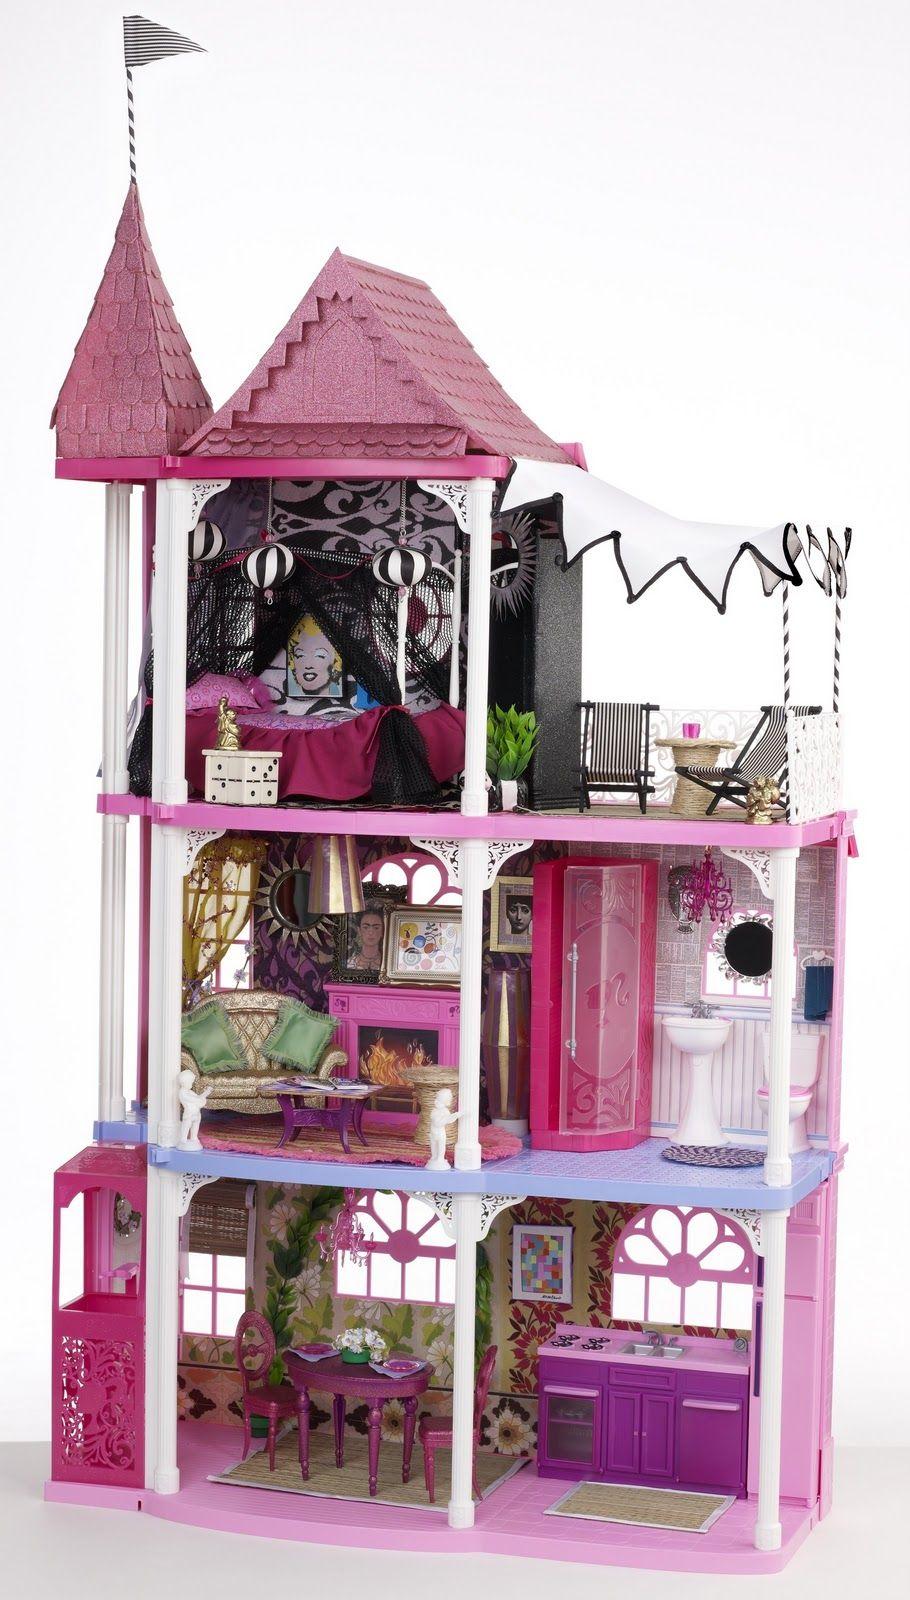 You had me at Barbie Dream House Barbie dream house